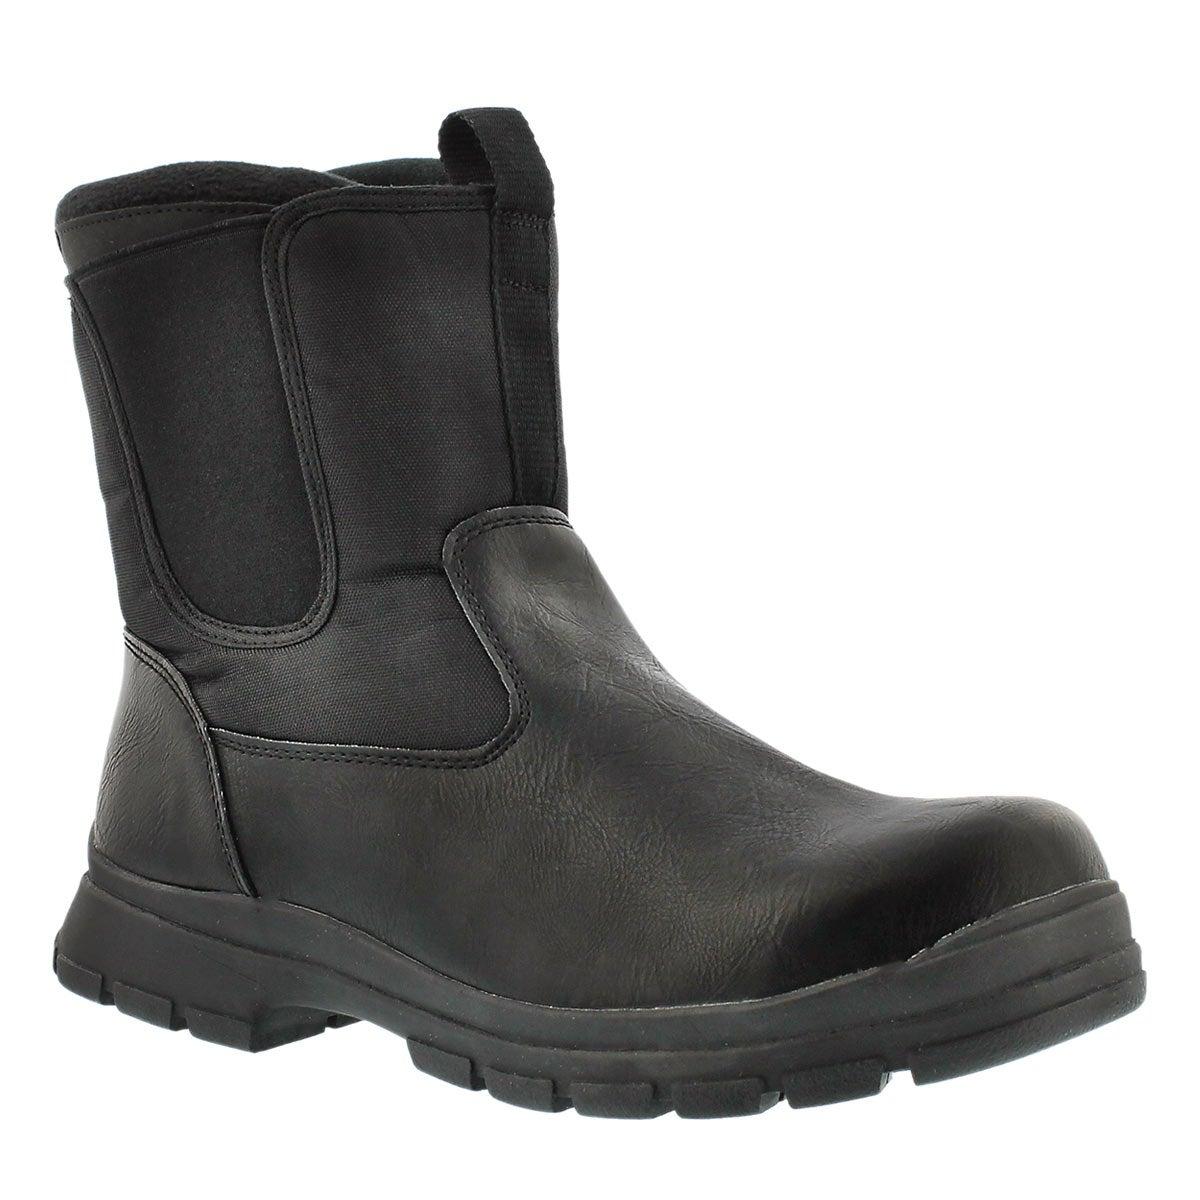 Mns Zago blk wtrpf winter boot